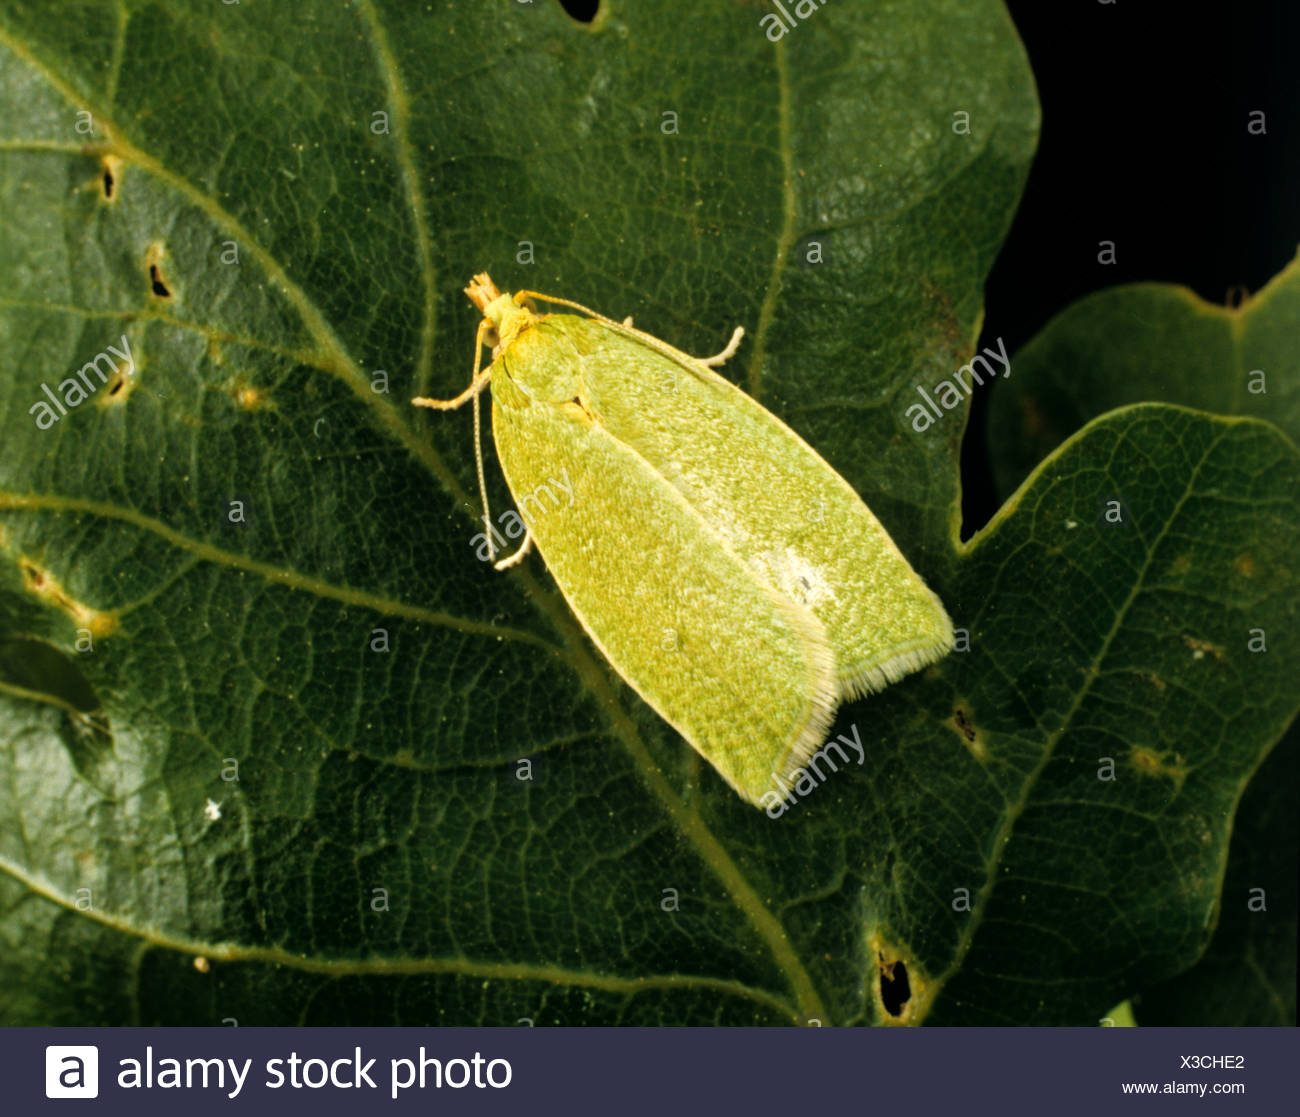 Oak tortrix moth (Tortrix viridana) on an oak leaf - Stock Image